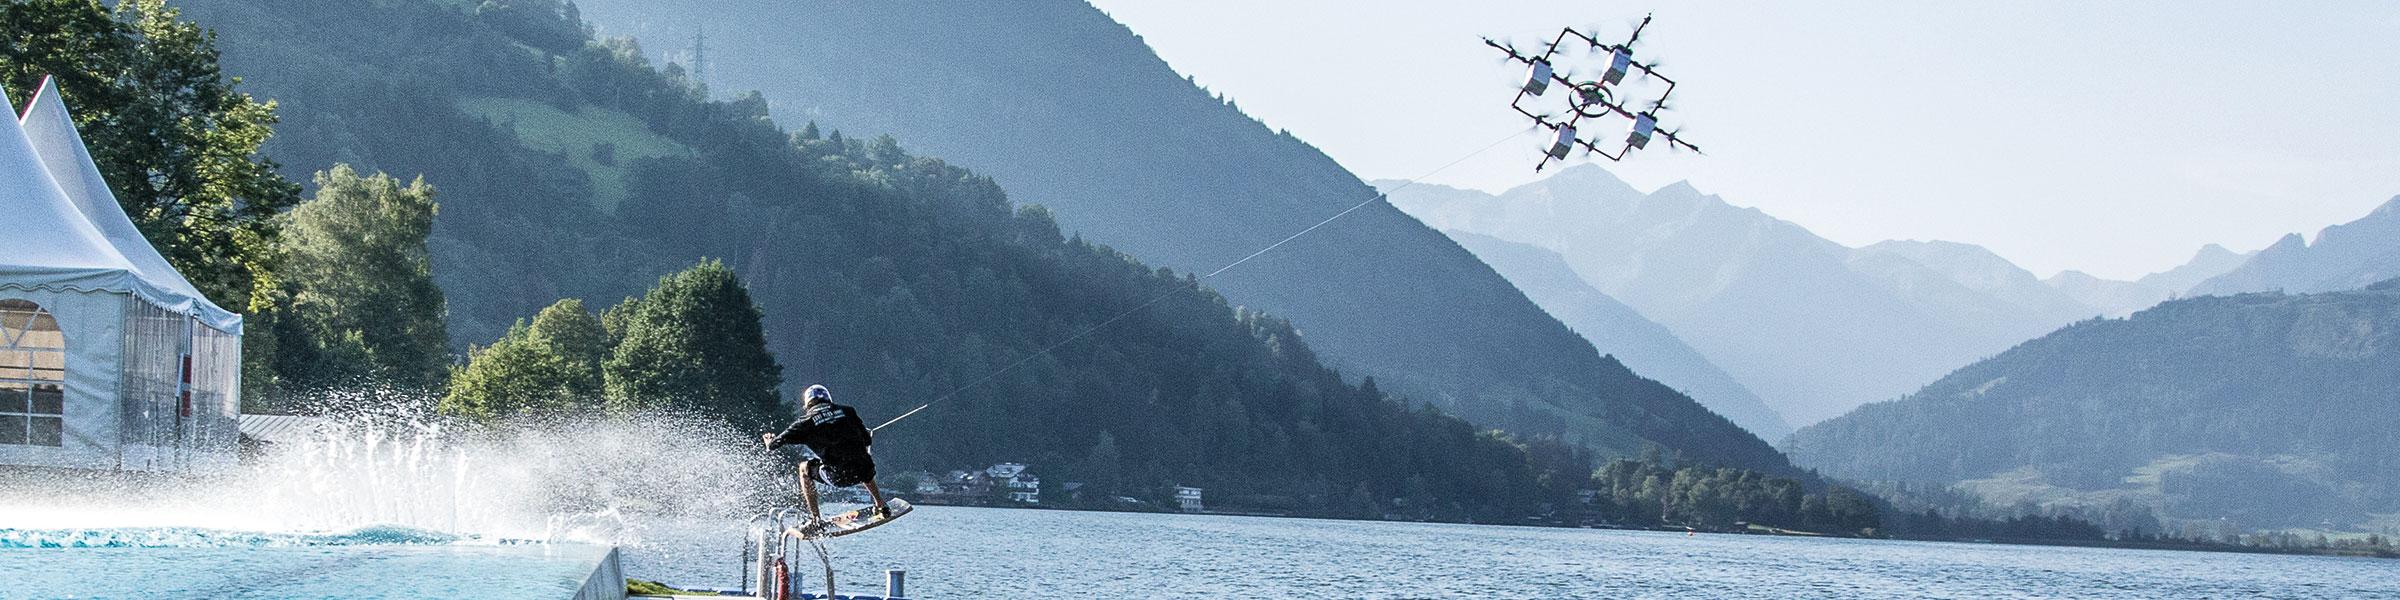 Drohnenstunt IONICA